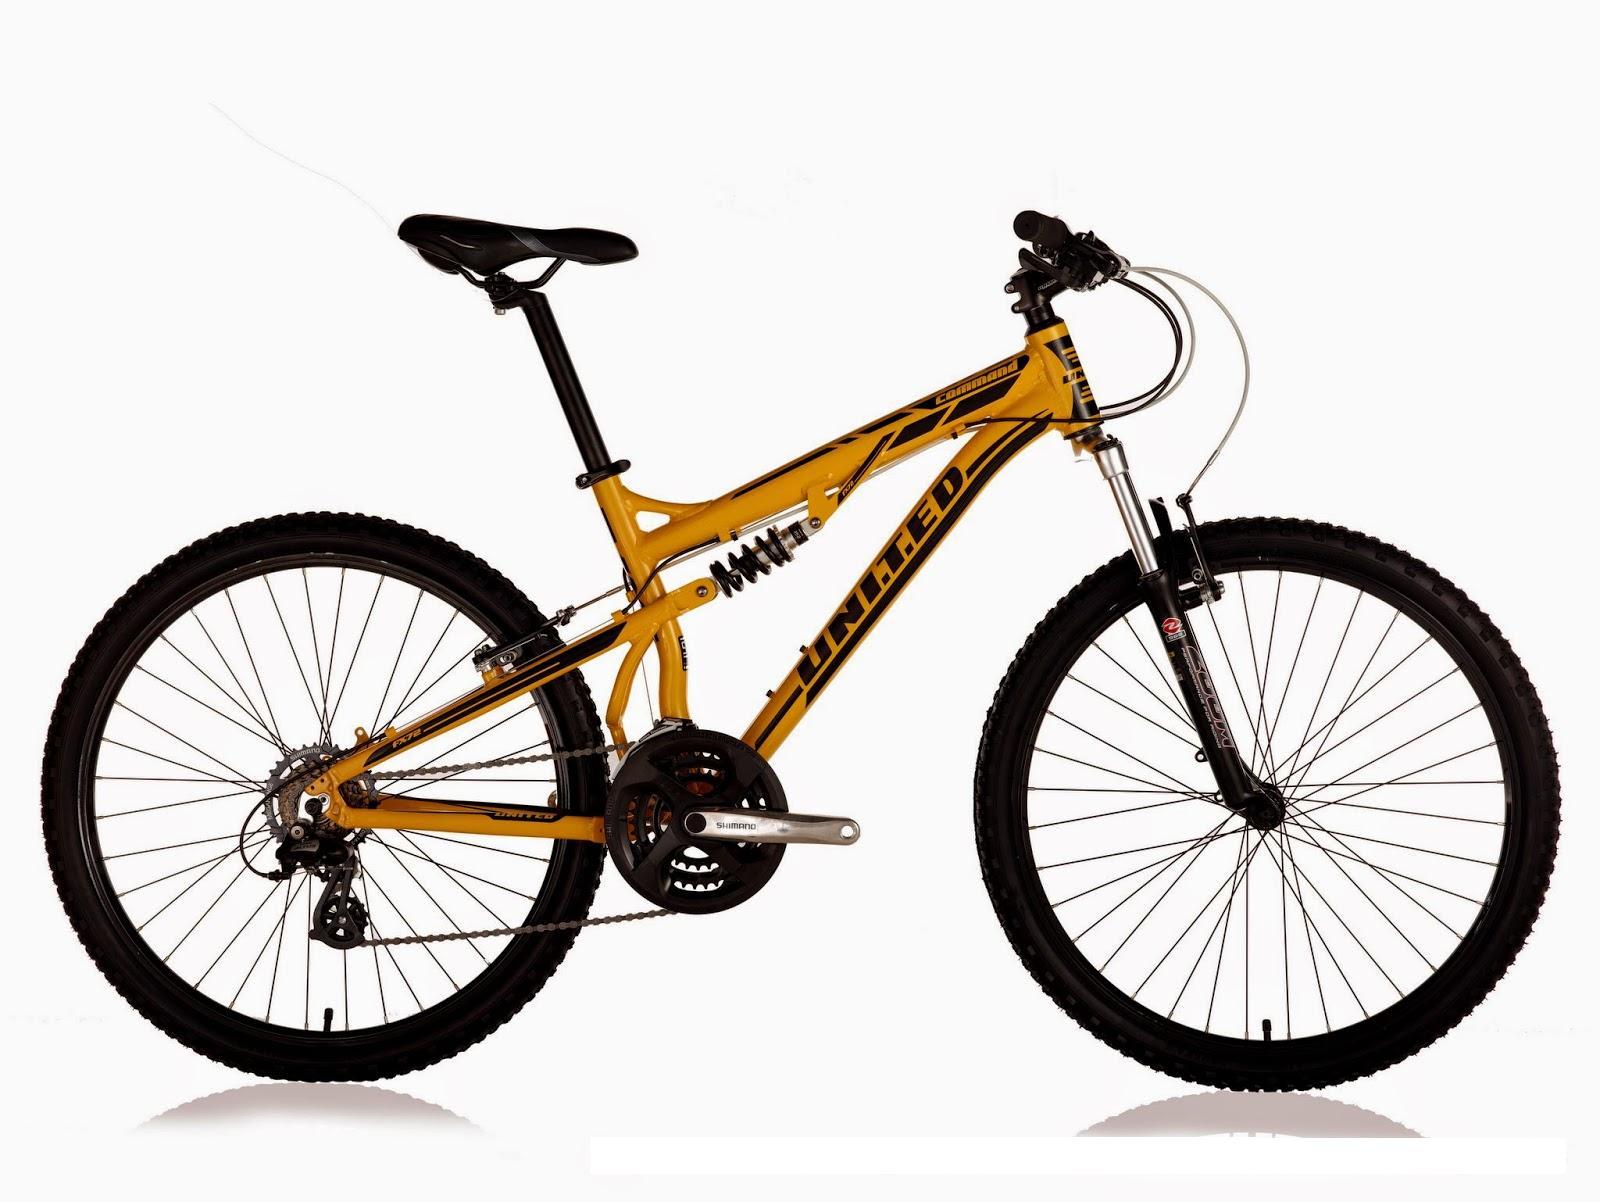 Mountain Bike Bagus Murah - RIDETVC.COM